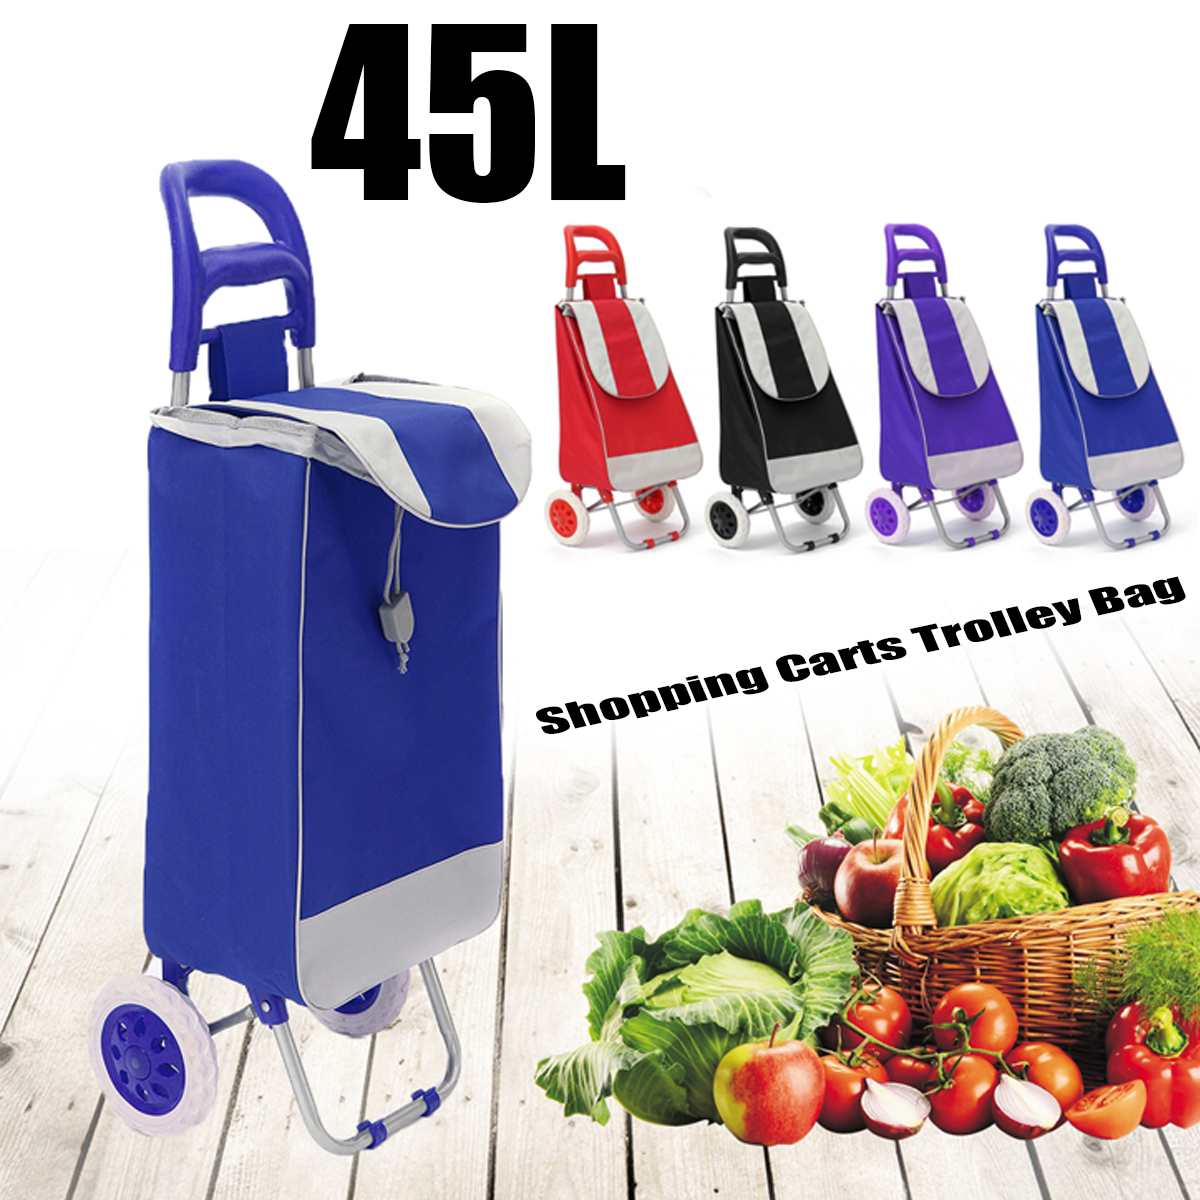 45L Foldable Shopping Trolley Bag On Wheels Push Tote Cart Carts Trolley Bag Basket Luggage Wheels Oxford Fabric Floding